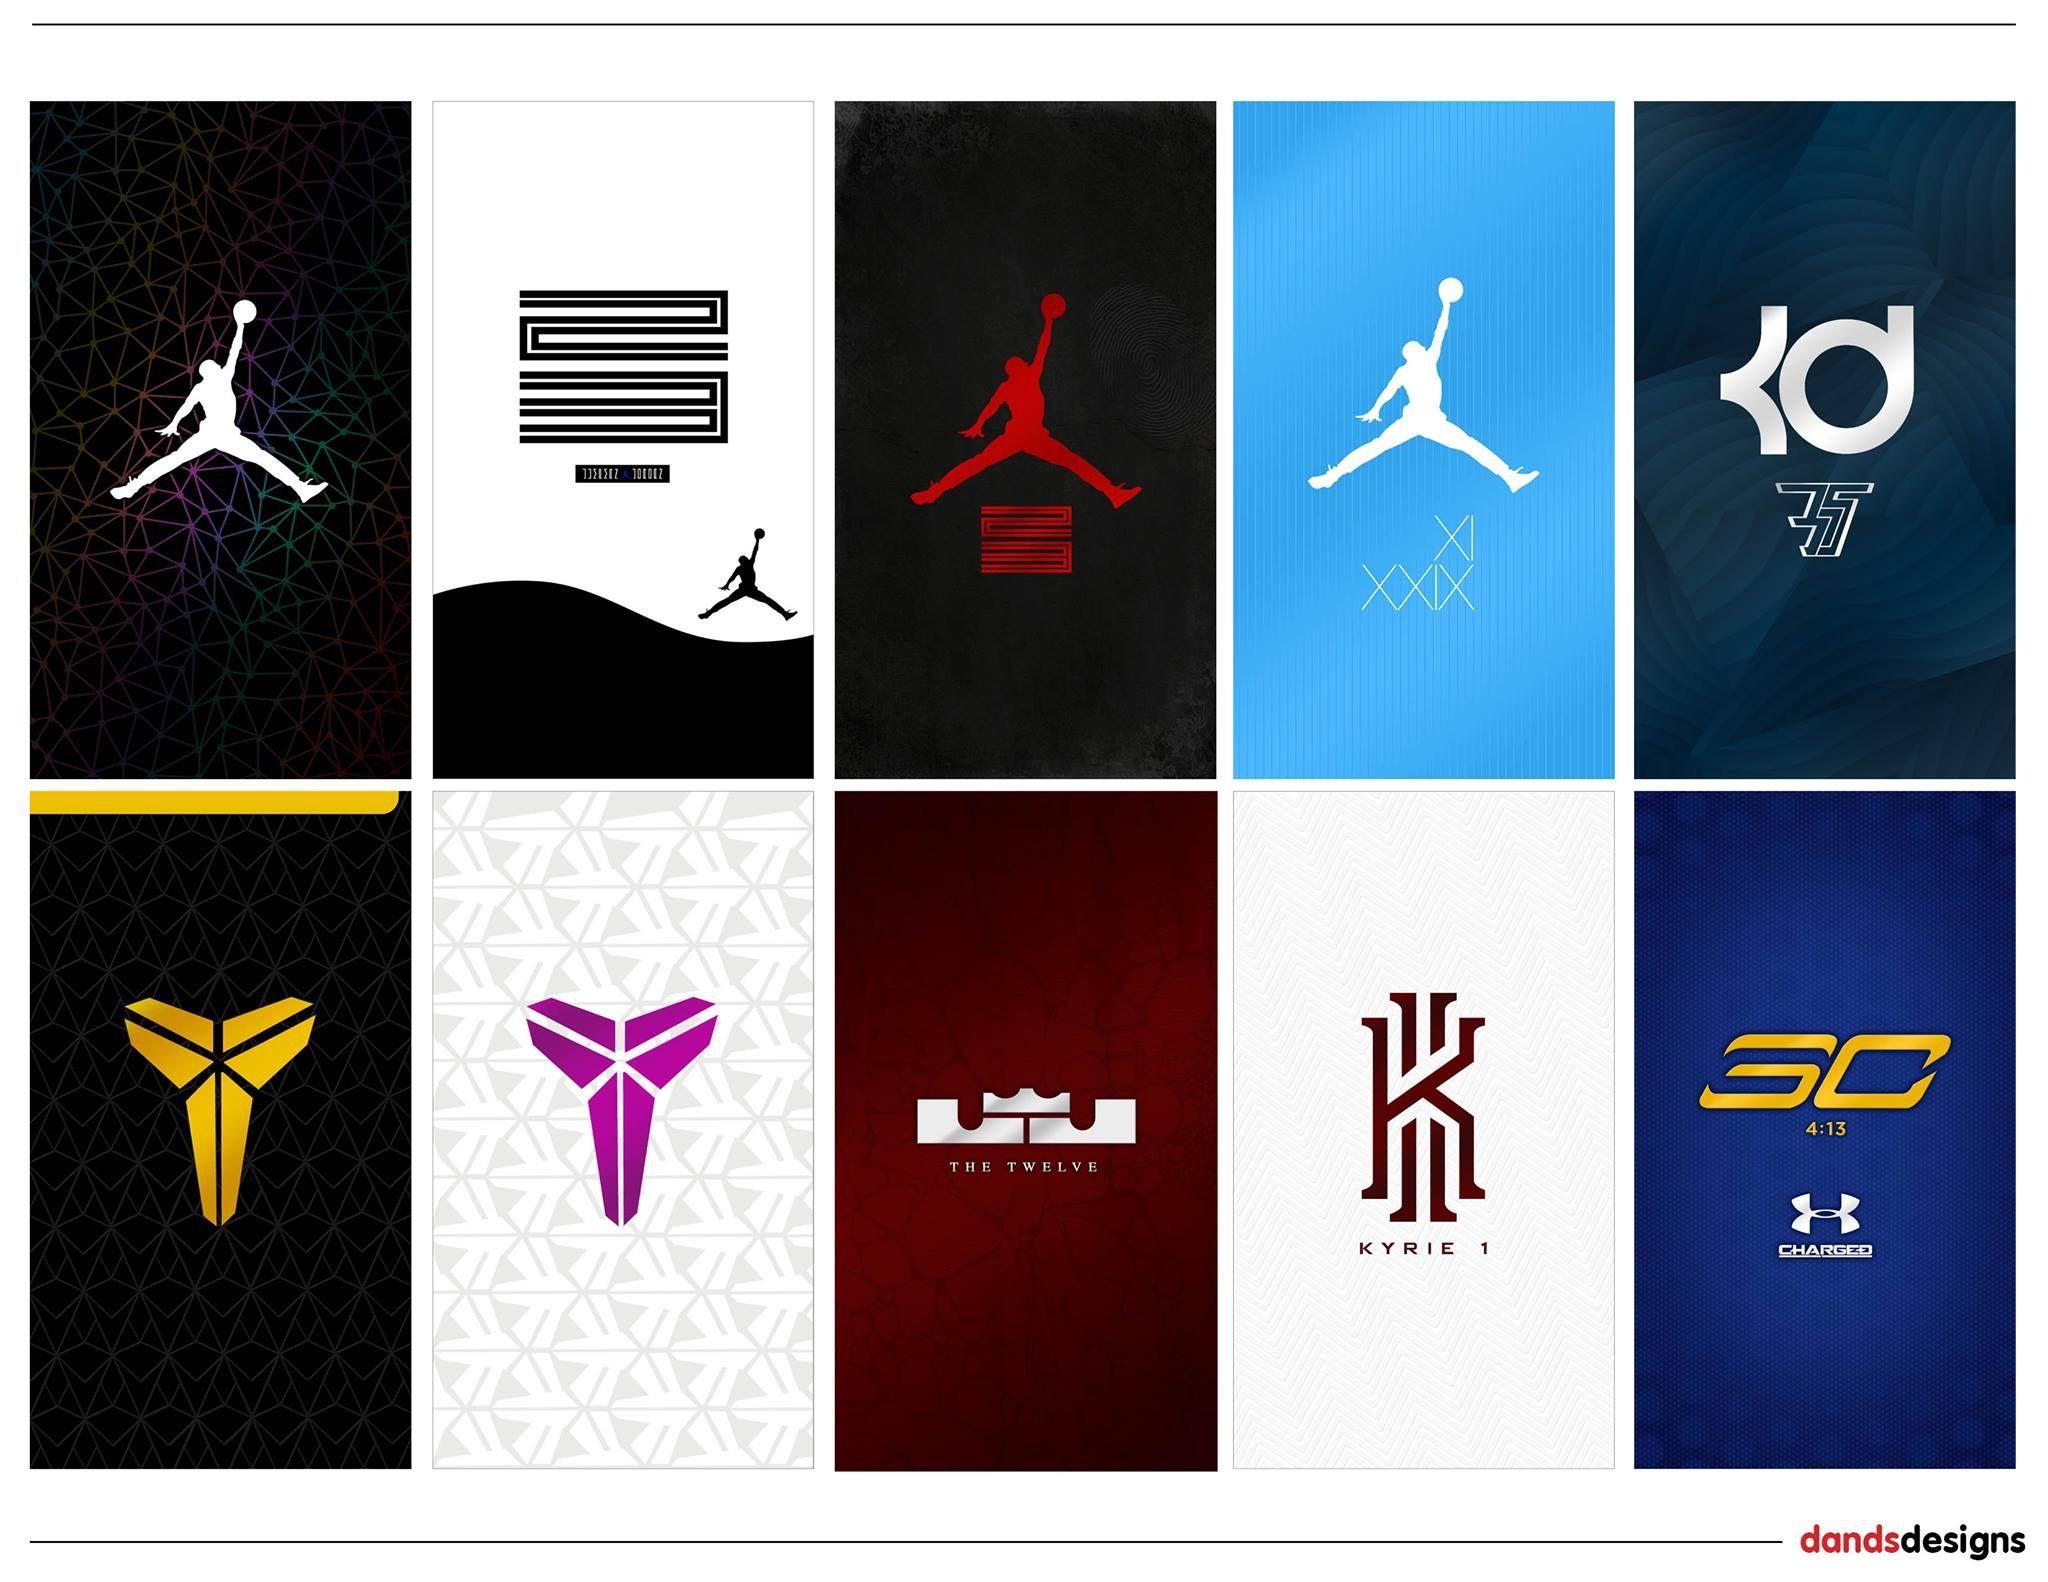 "Cool Mobile Wallpaper by DandsDesigns at Facebook ""Dands"